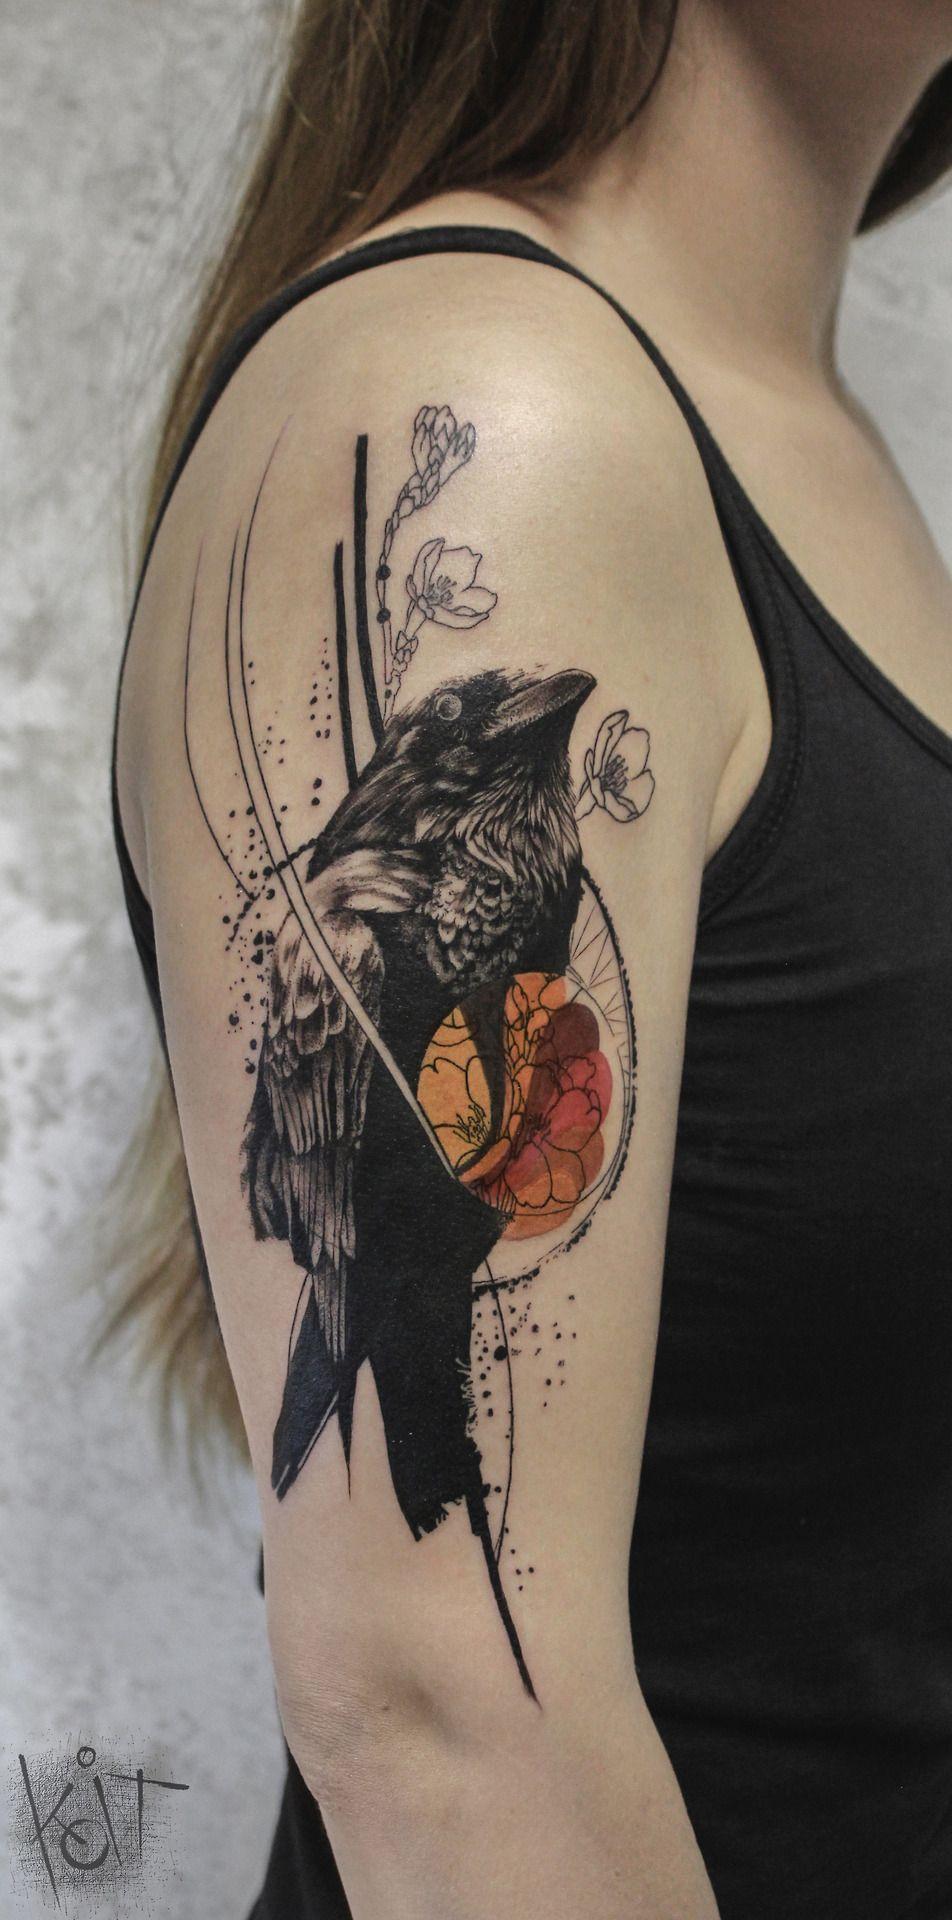 Koit Tattoo artist from Berlin. Black and orange graphic style ... - Tattoo Studio Bielefeld